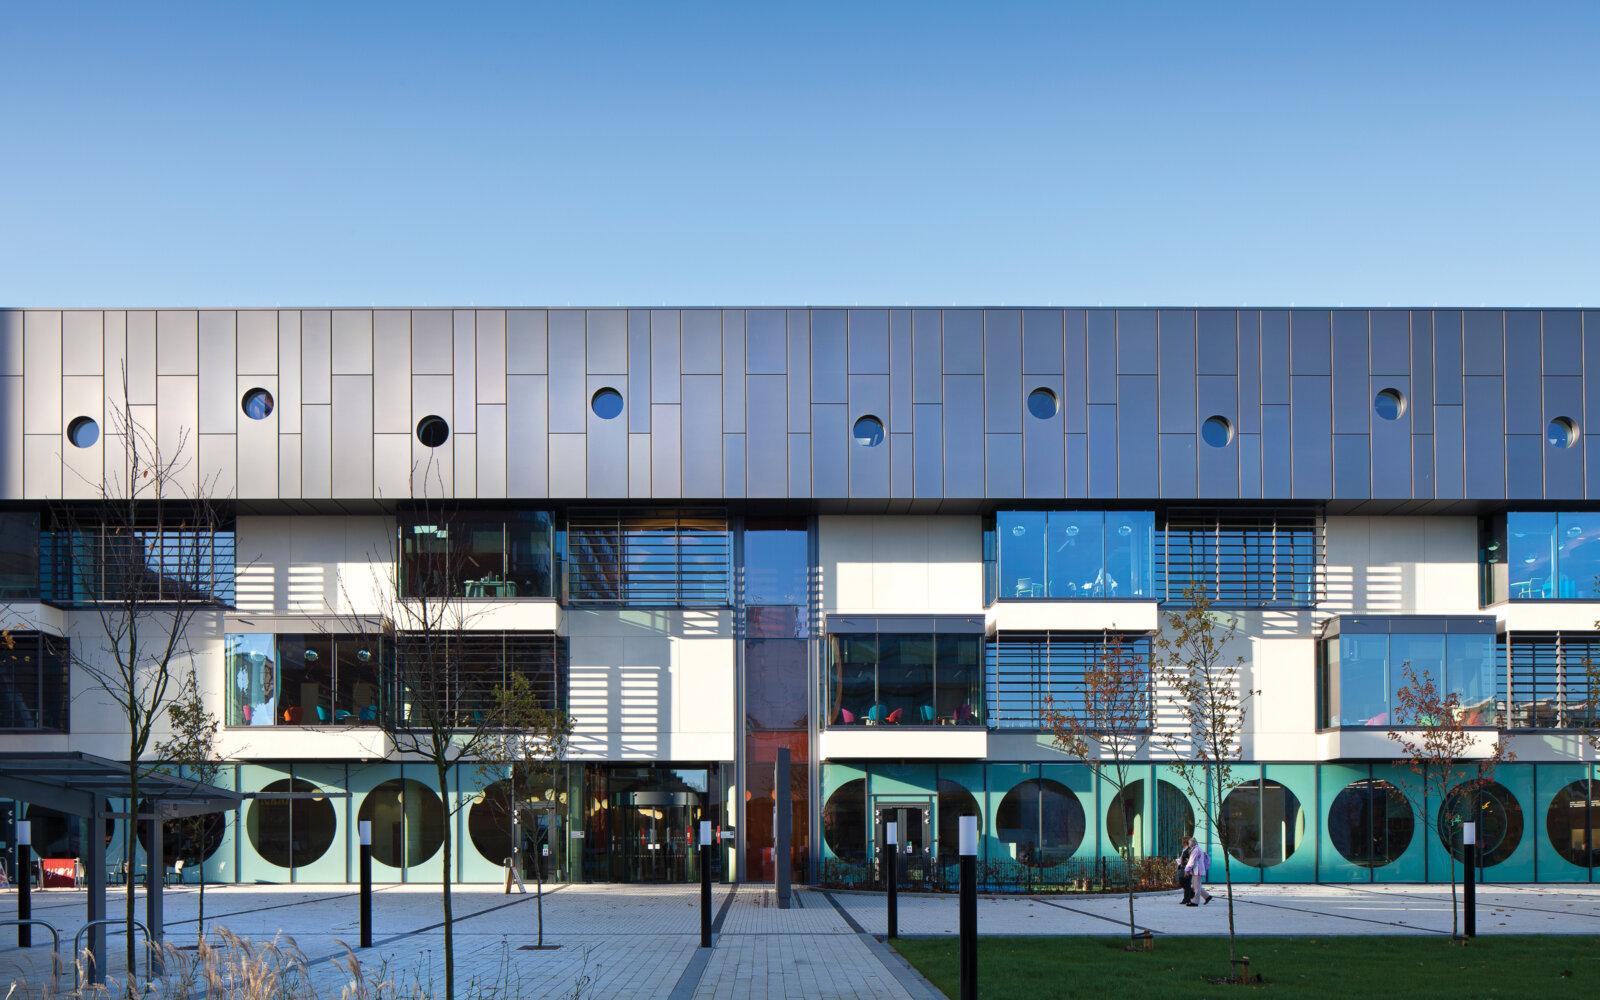 The Forum exterior